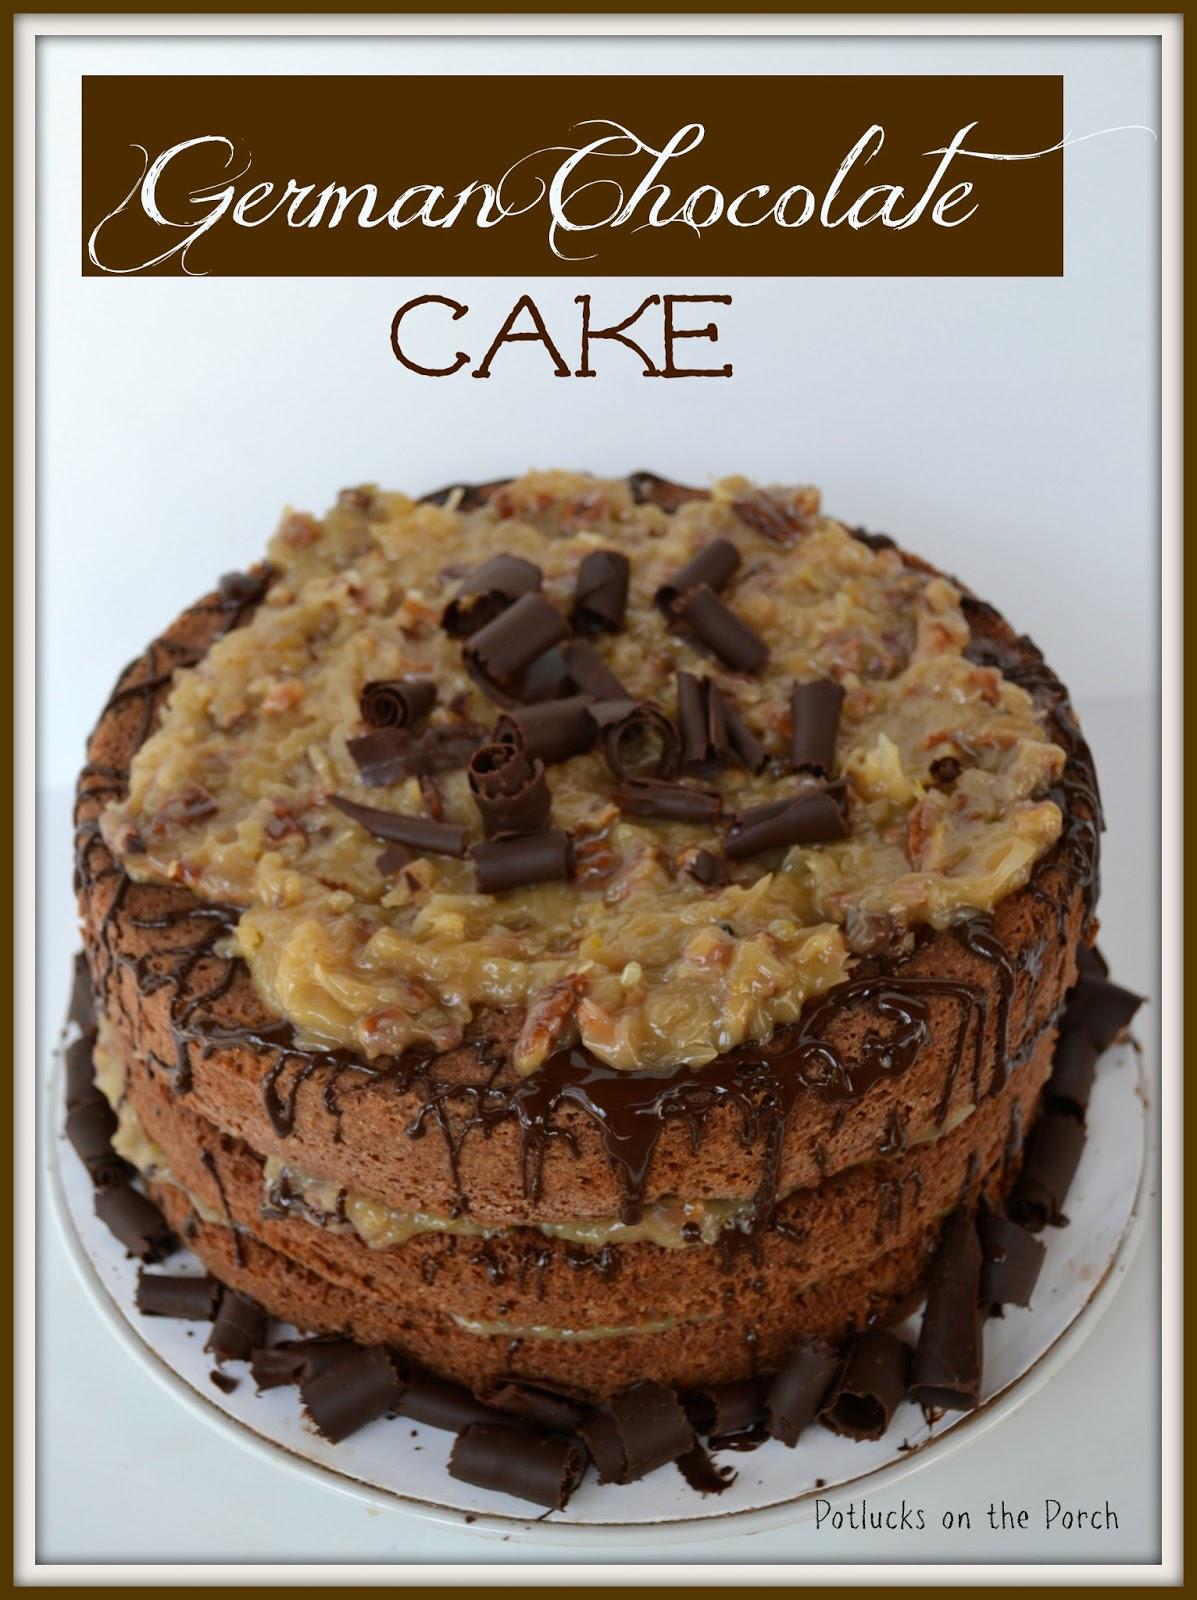 Potlucks On The Porch The Best German Chocolate Cake